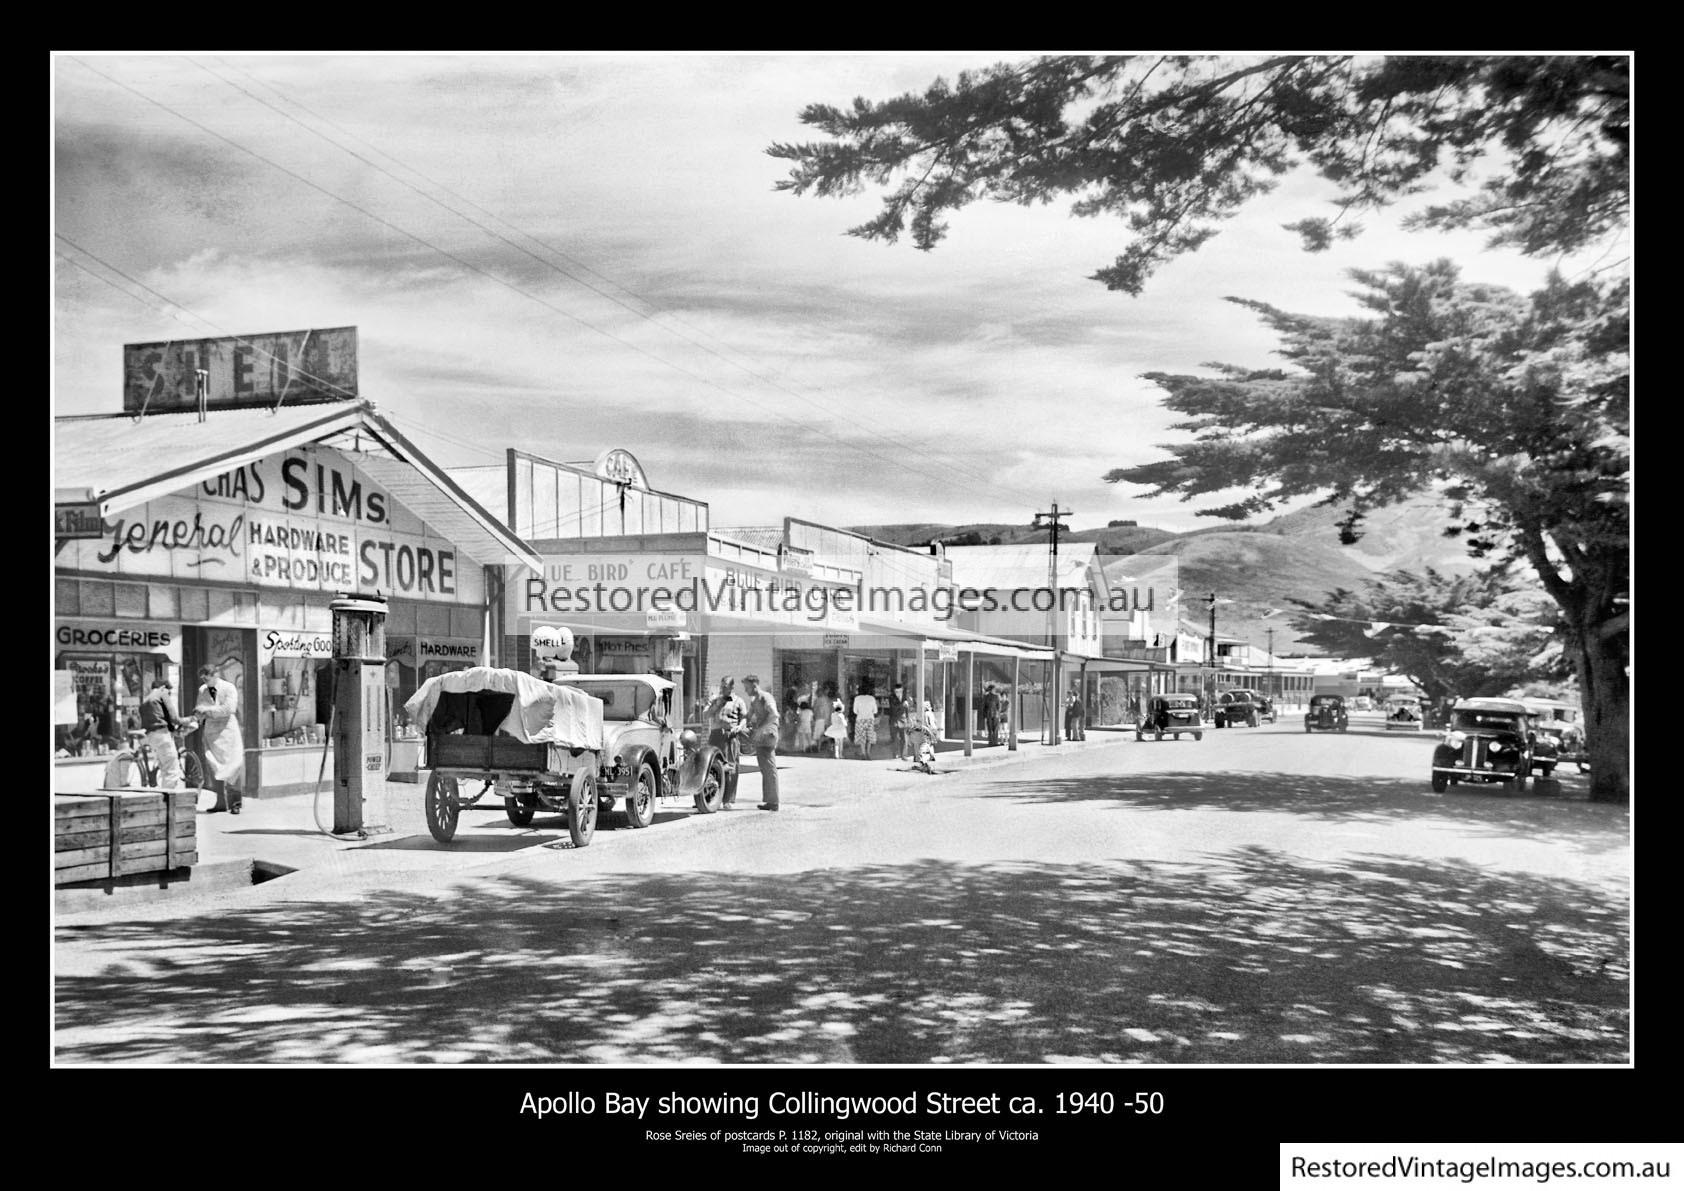 Apollo Bay Showing Collingwood Street Ca. 1940 – 50